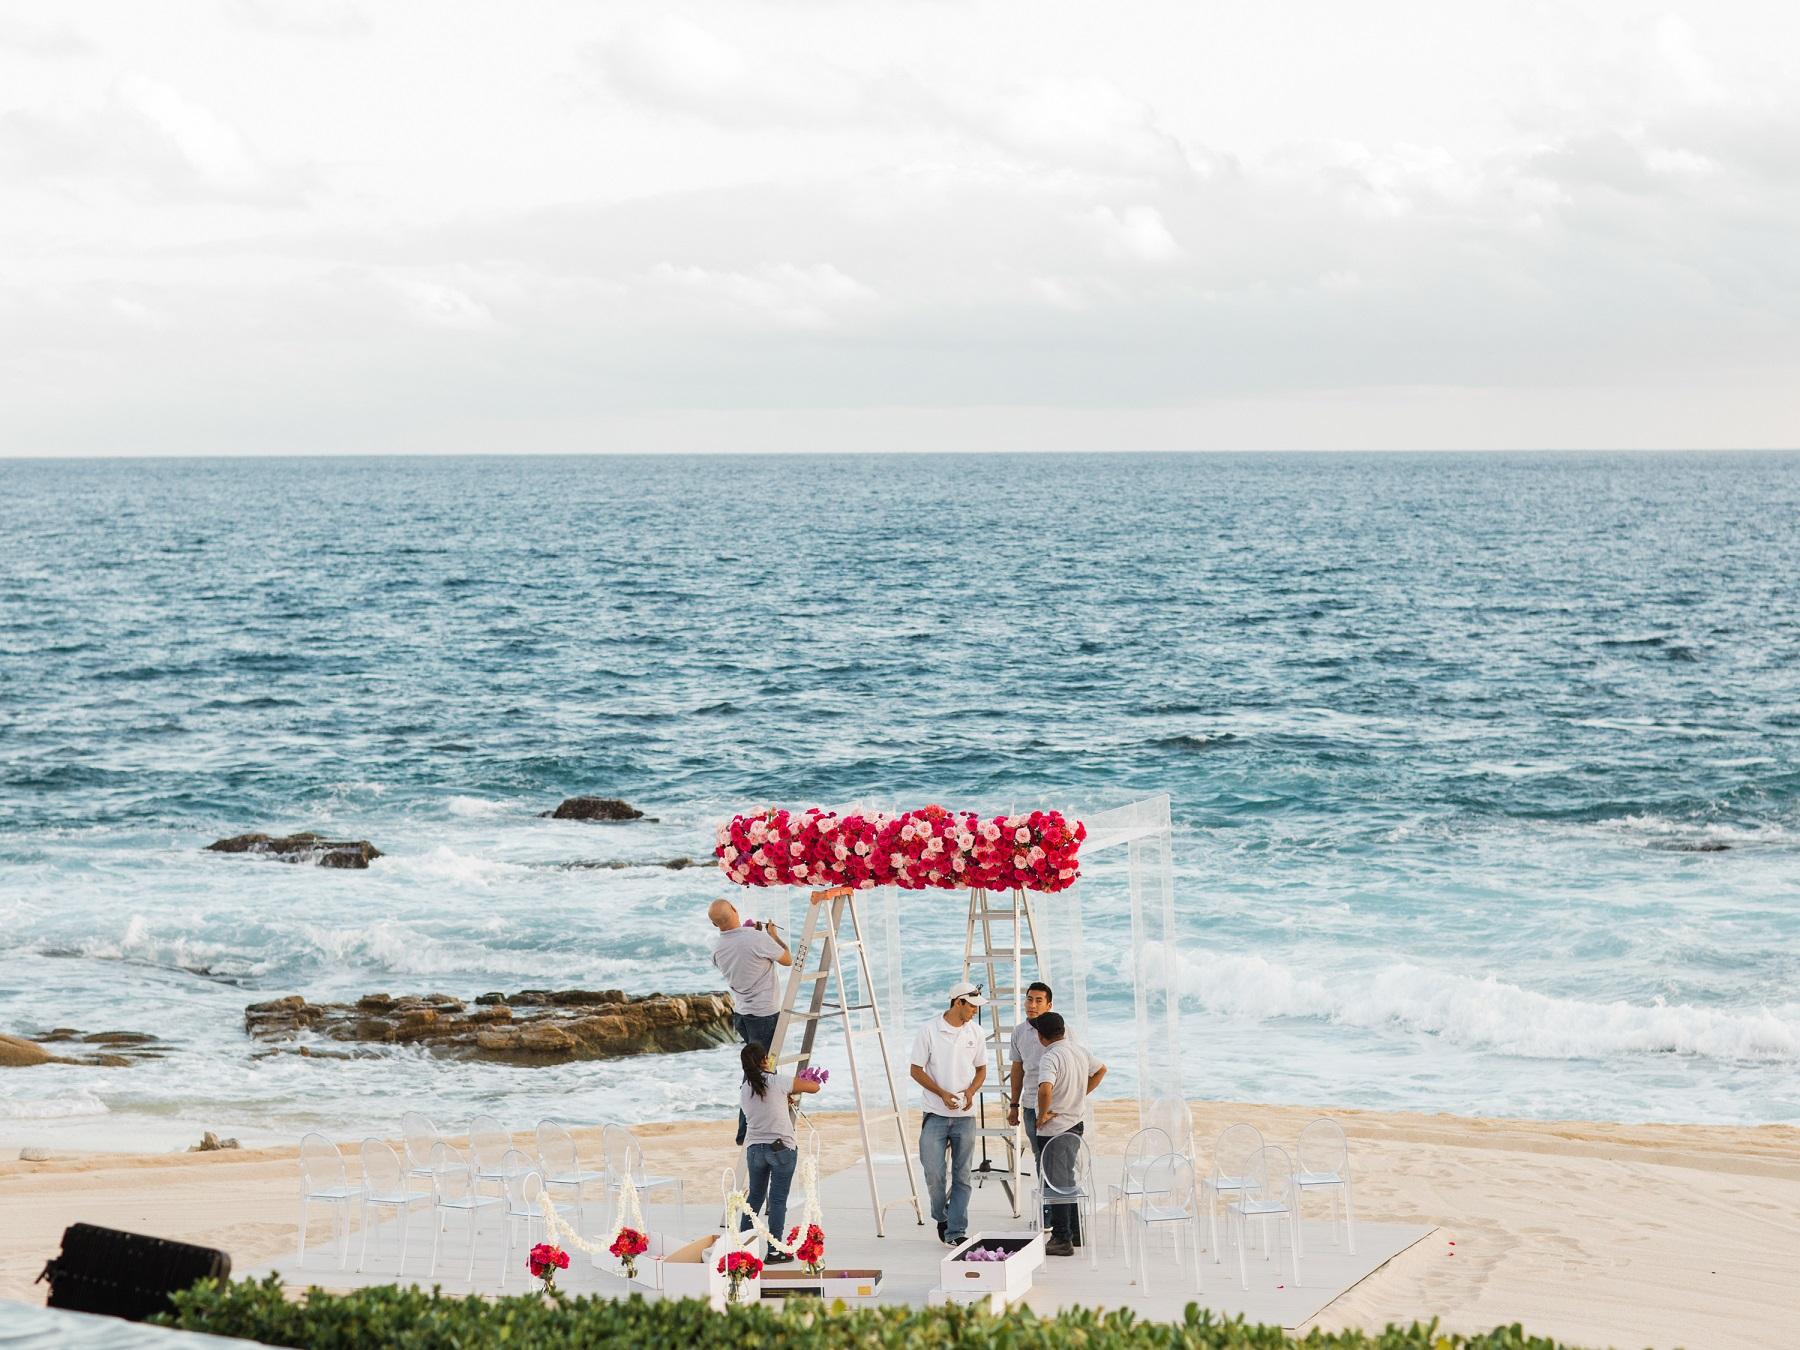 floral ceremony arch on the beach cabo san lucas elena damy destination weddings